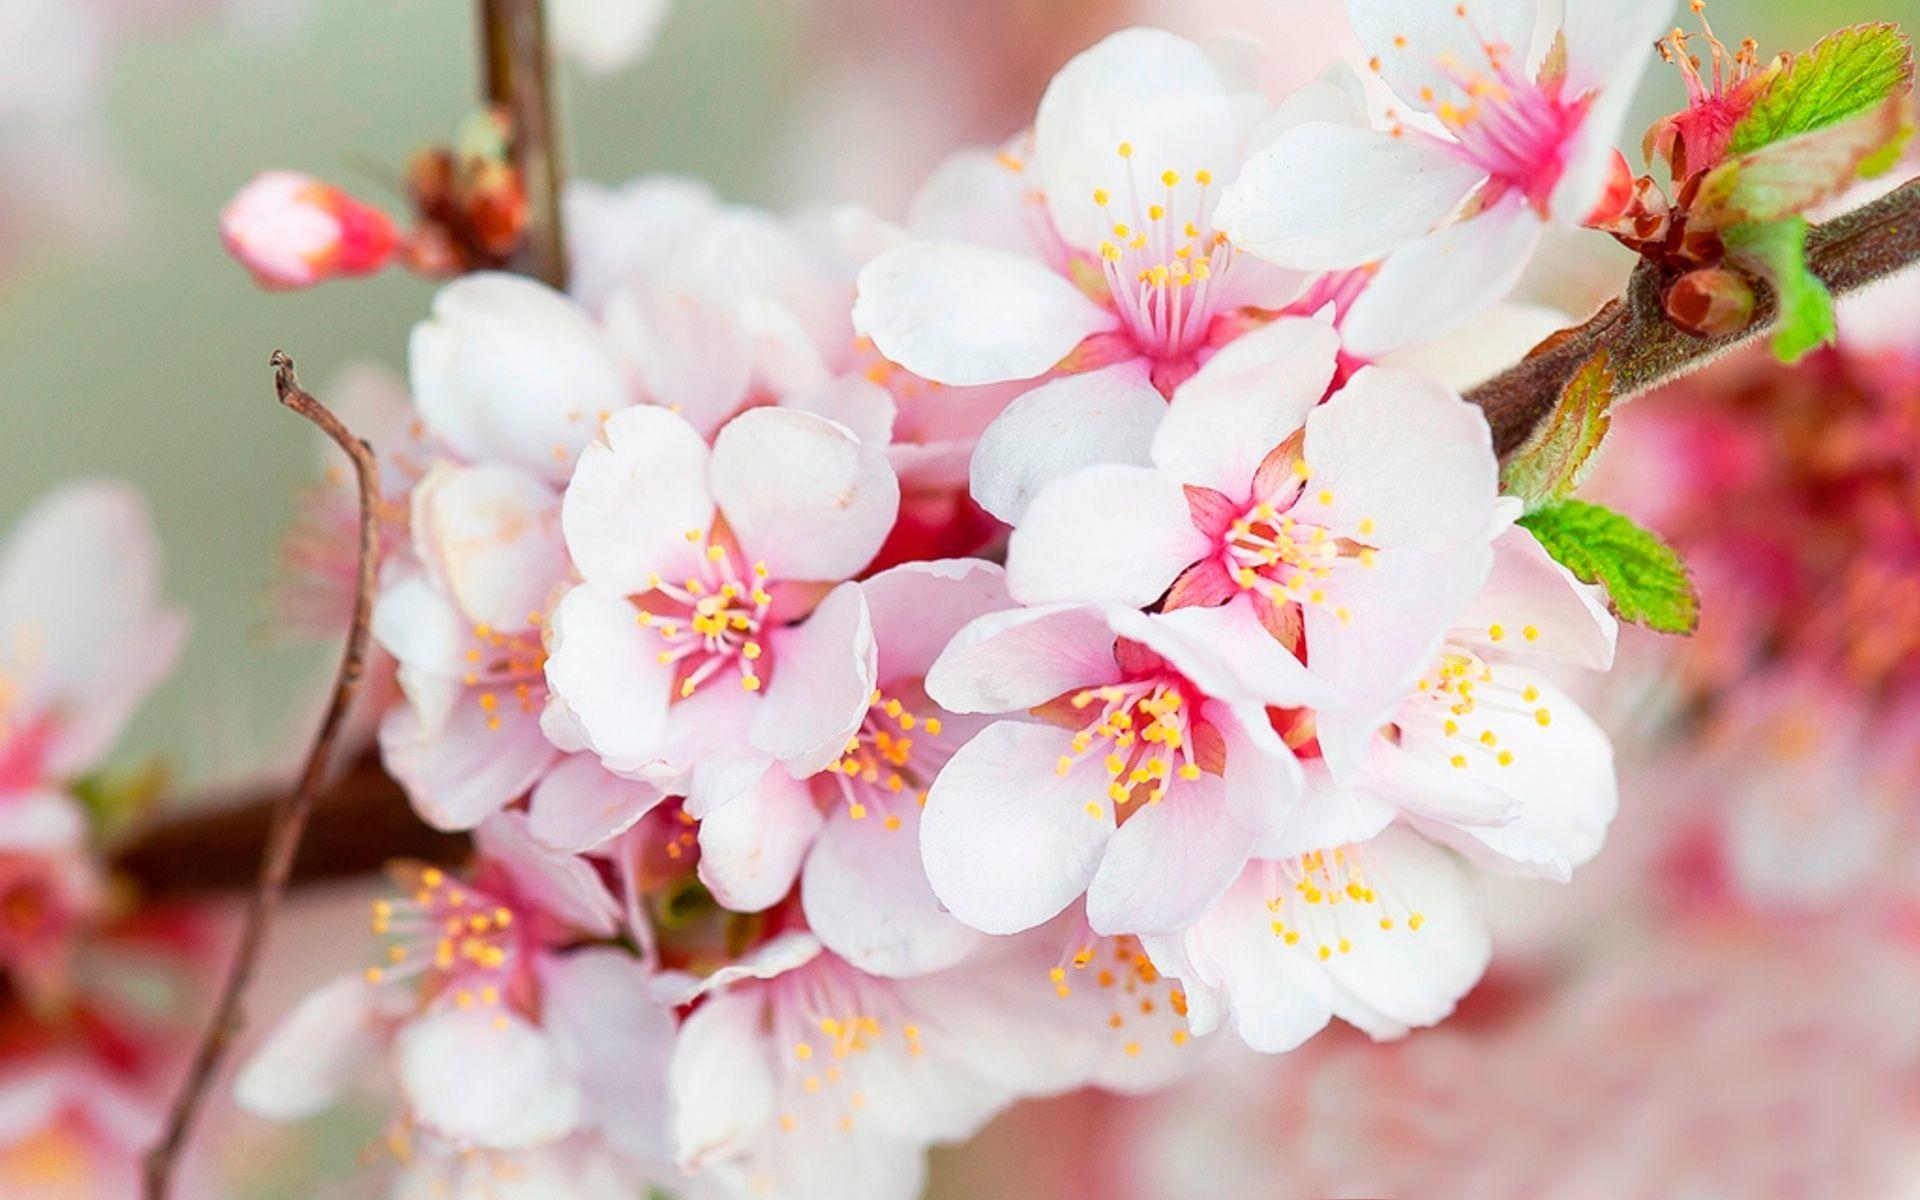 Cherry Blossom Live Wallpaper High Resolution Cherry Blossom